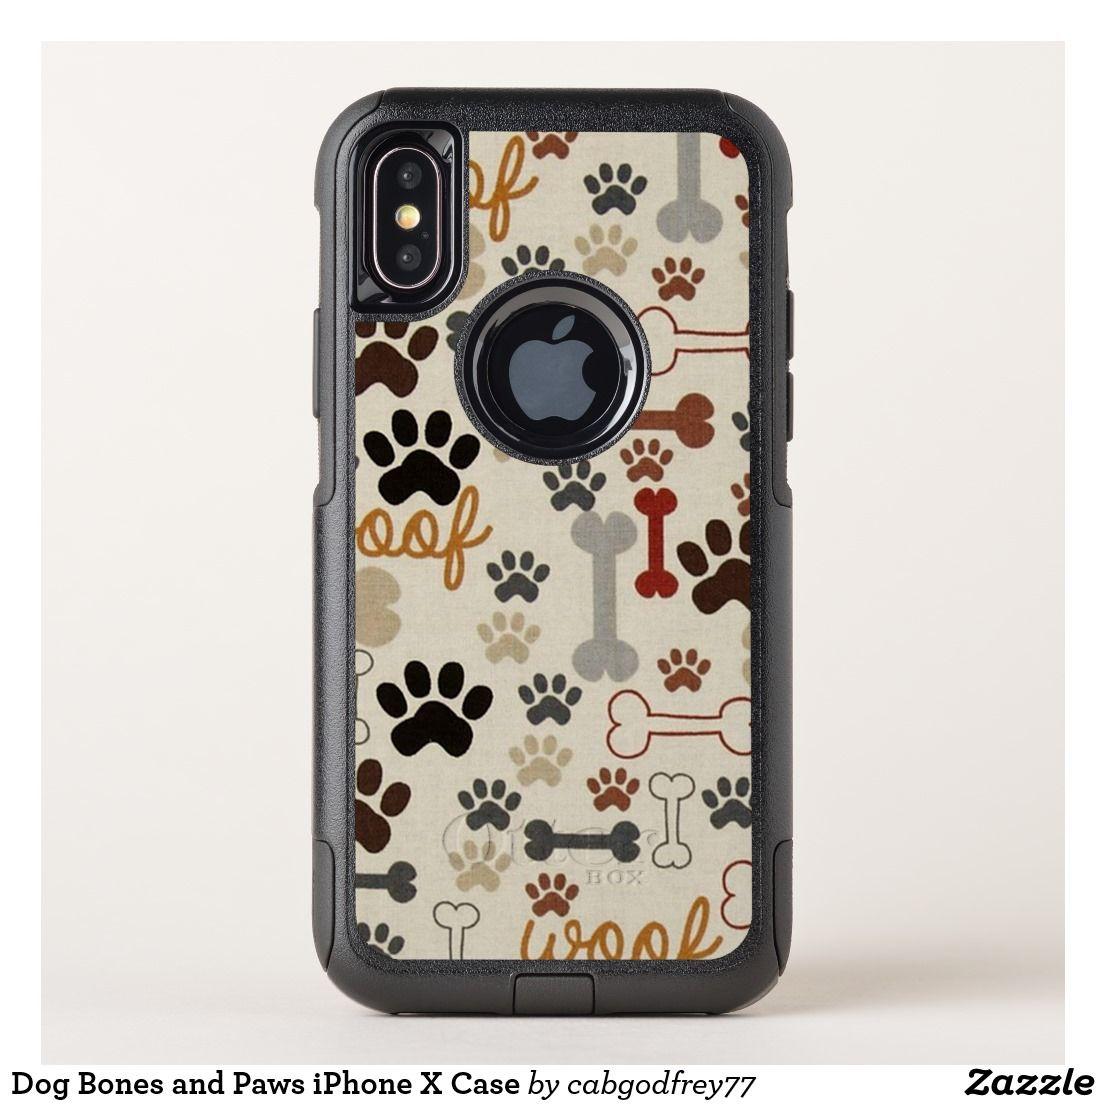 Dog bones and paws iphone x case dog bones